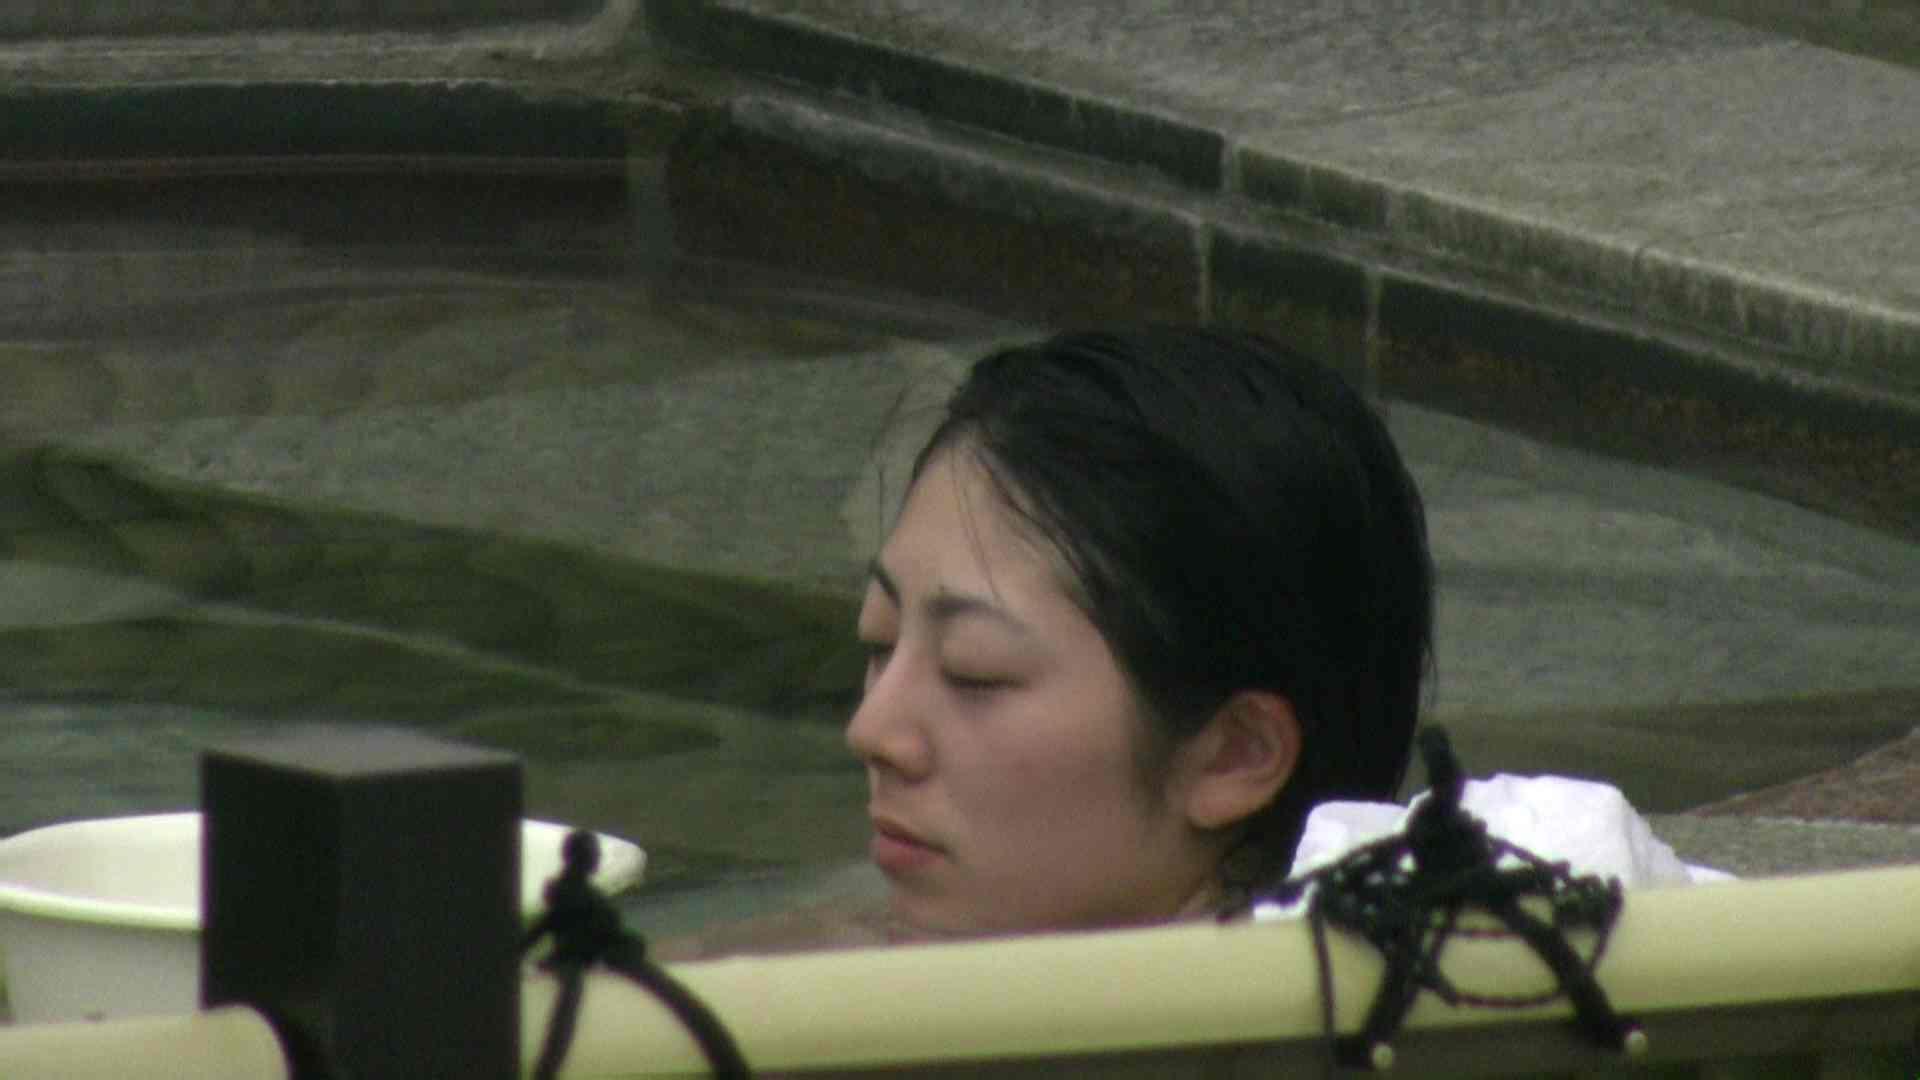 Aquaな露天風呂Vol.04 露天風呂編  94PIX 8